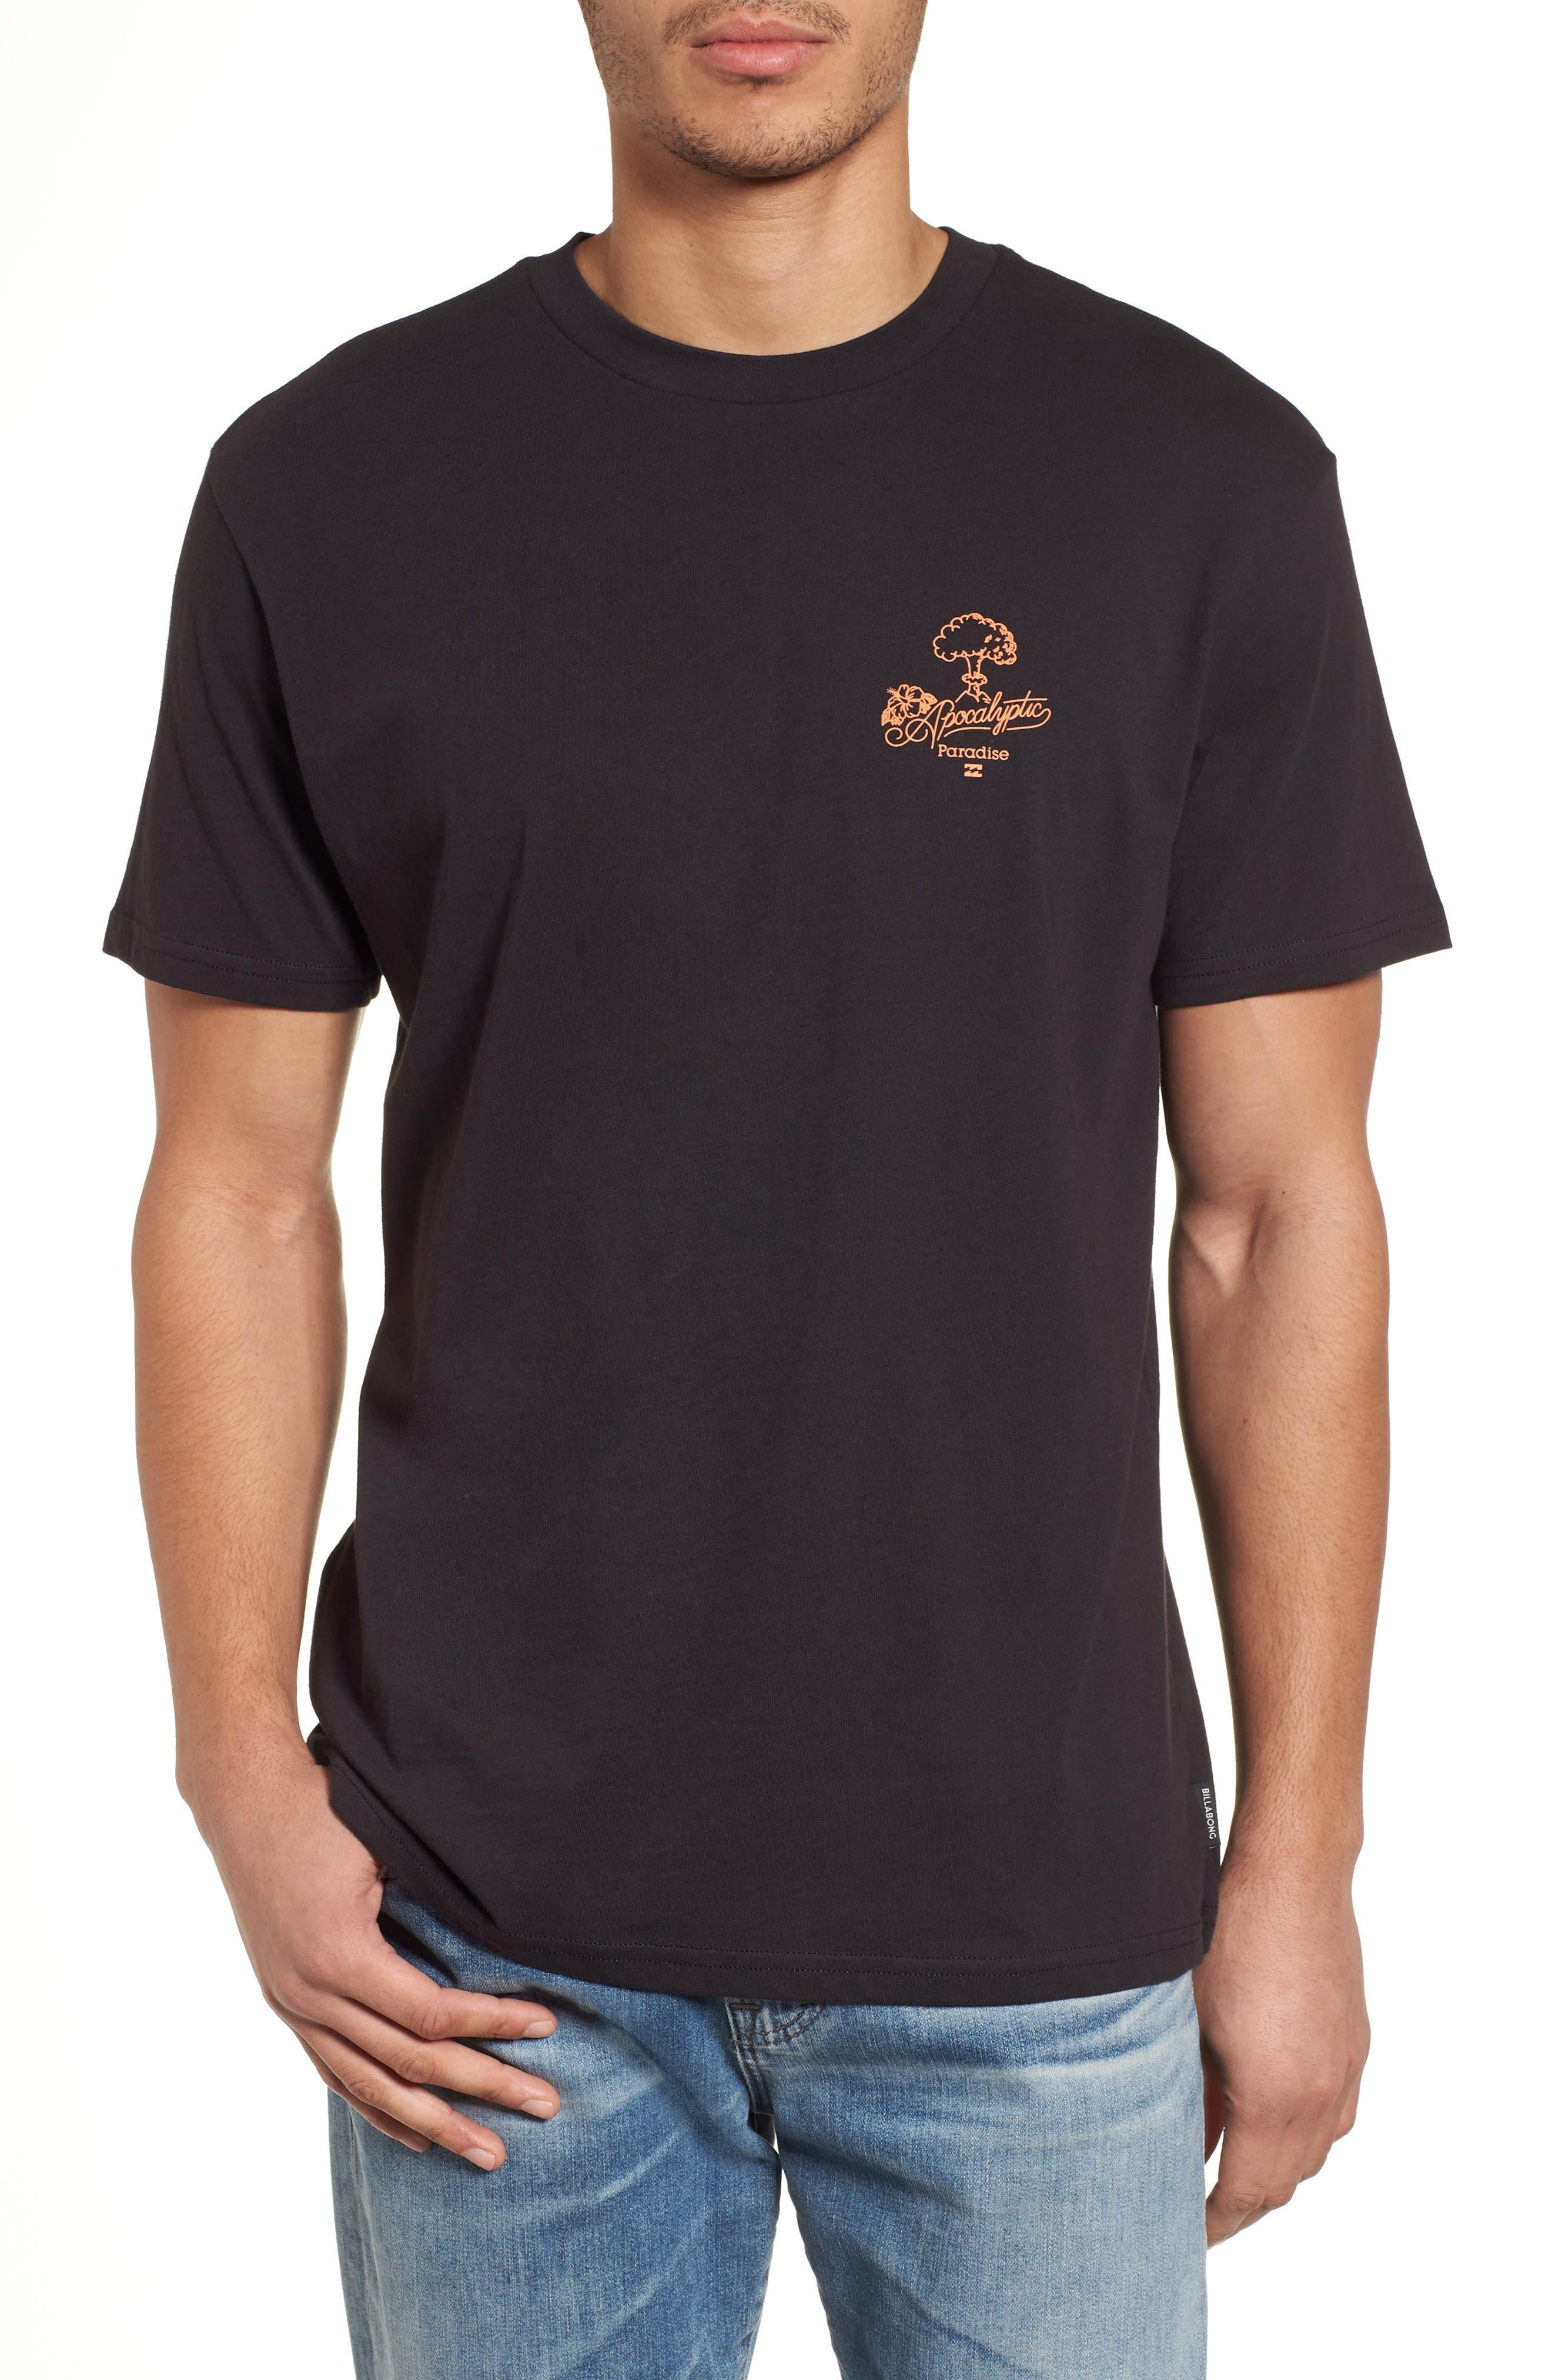 Main Image - Billabong Apocalyptic Graphic T-Shirt